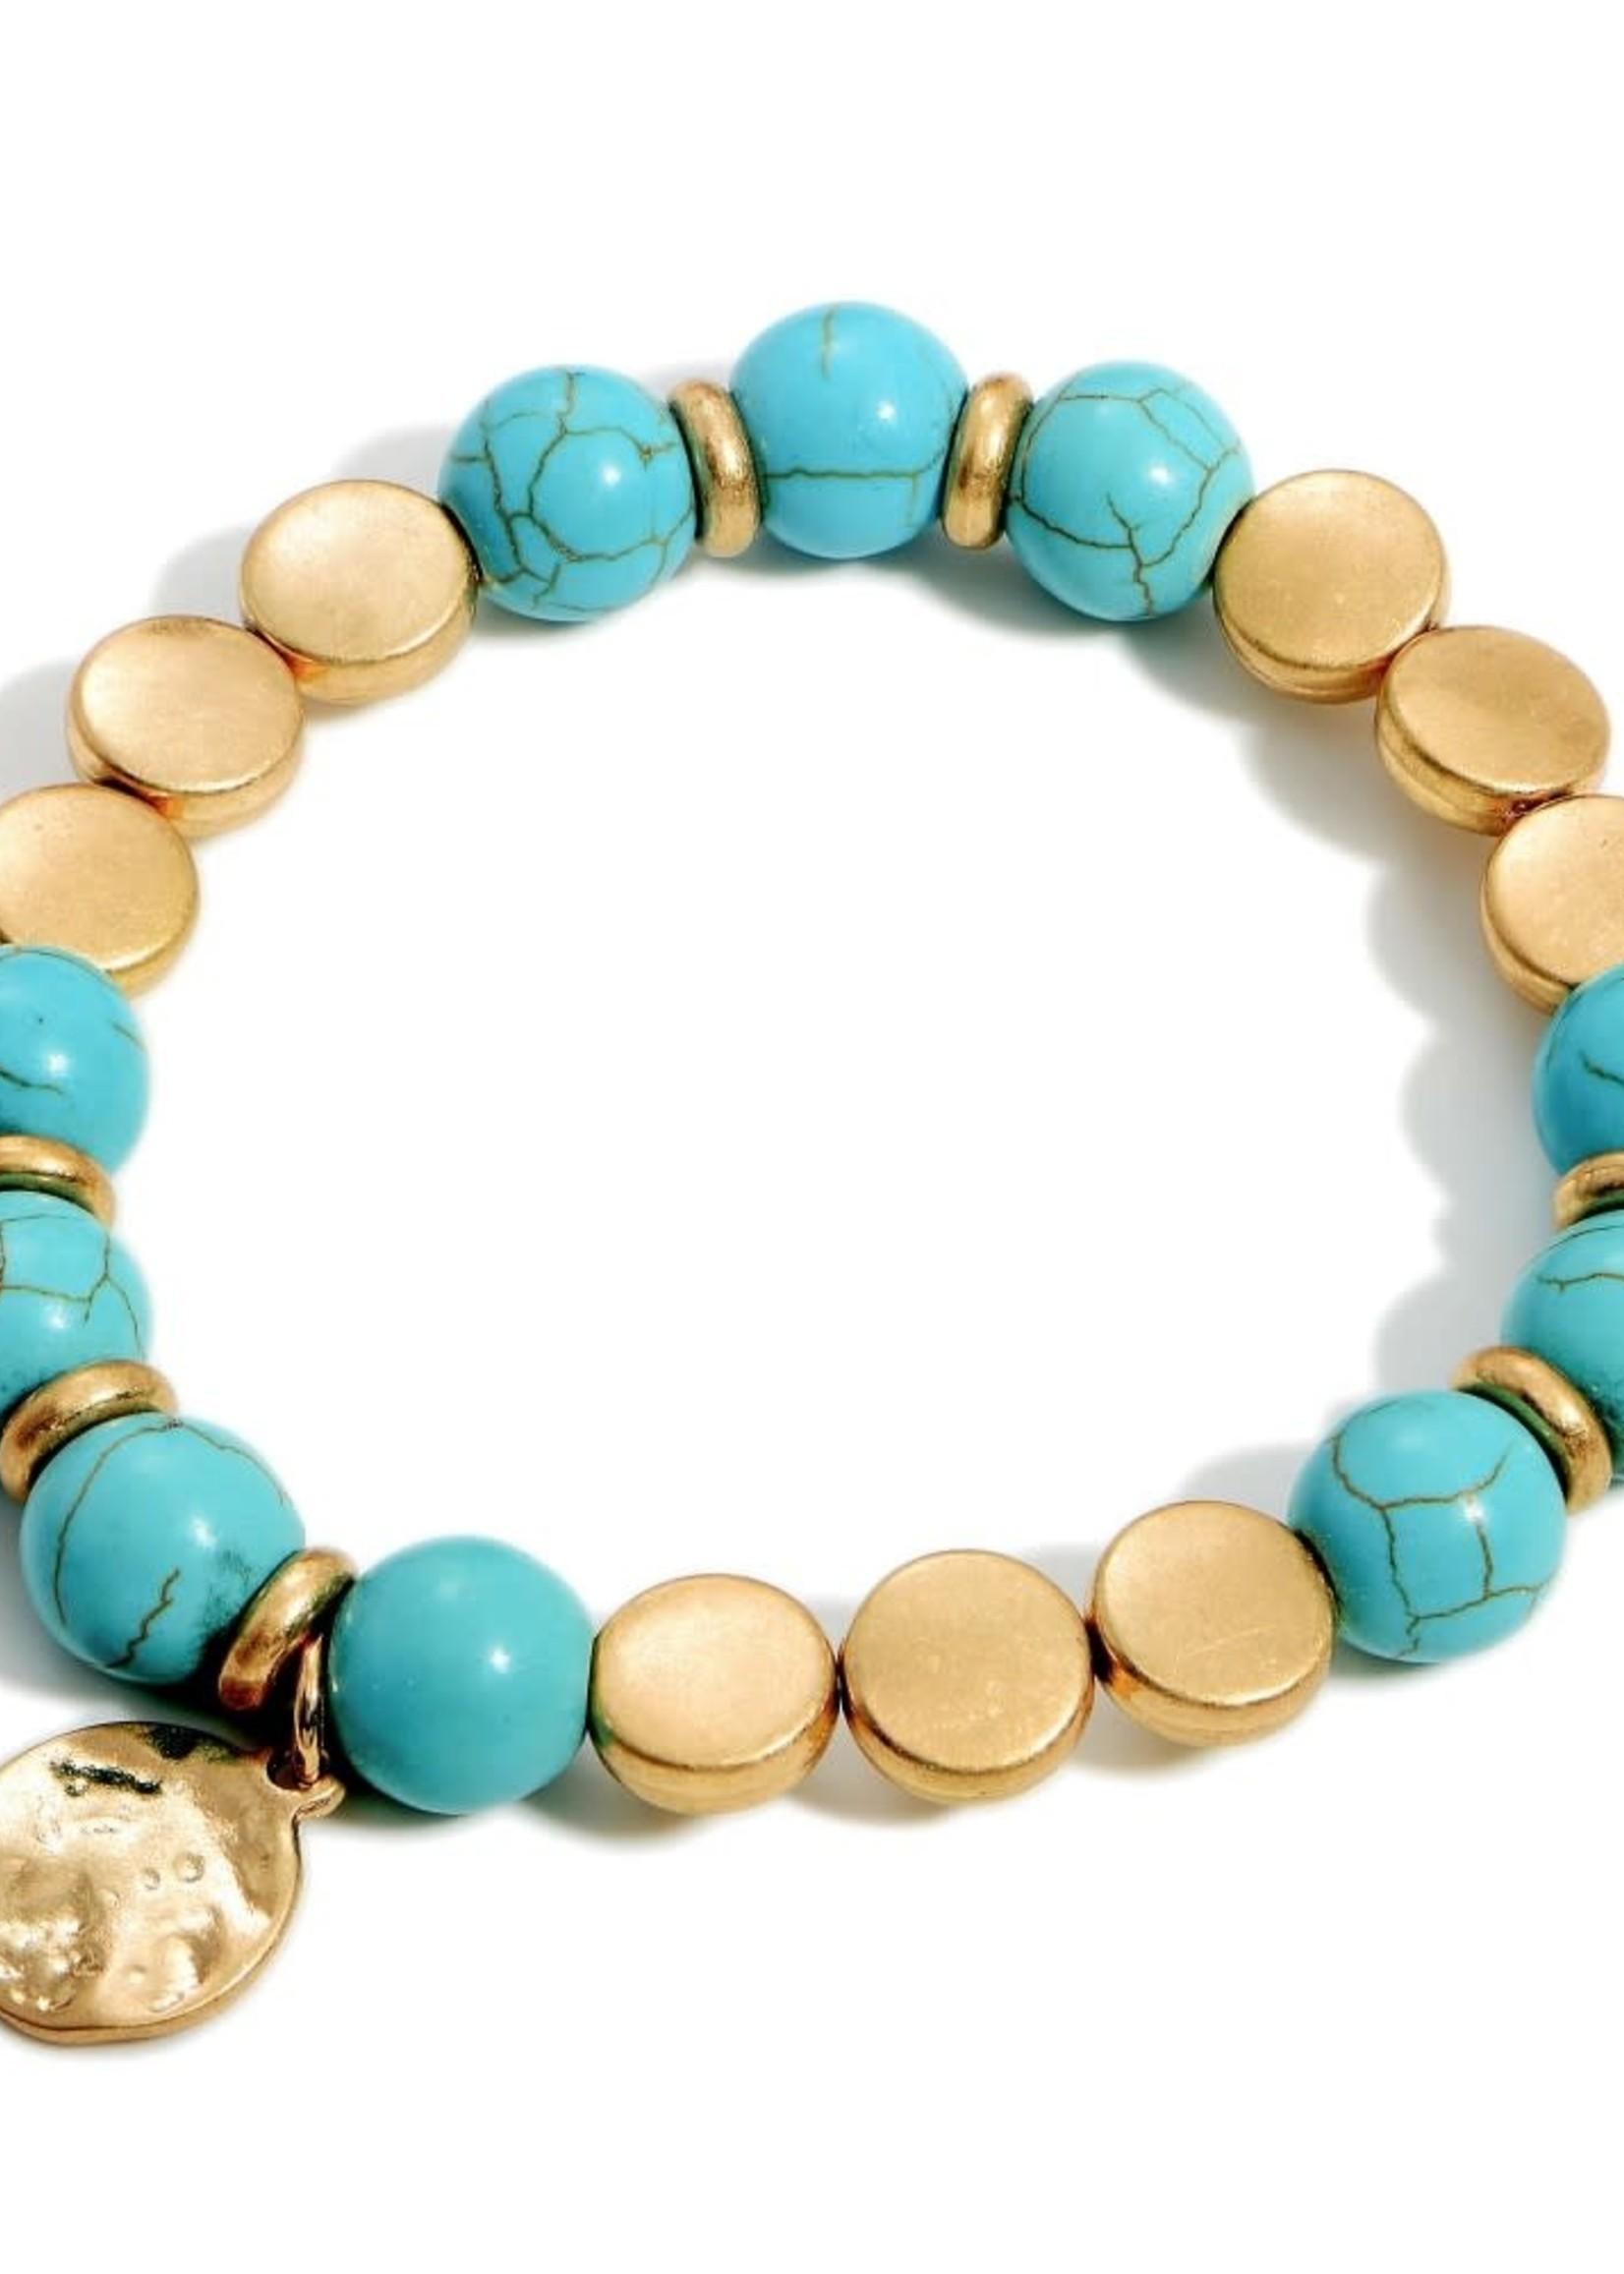 Beaded Stretch Bracelet Hammered Gold Pendant